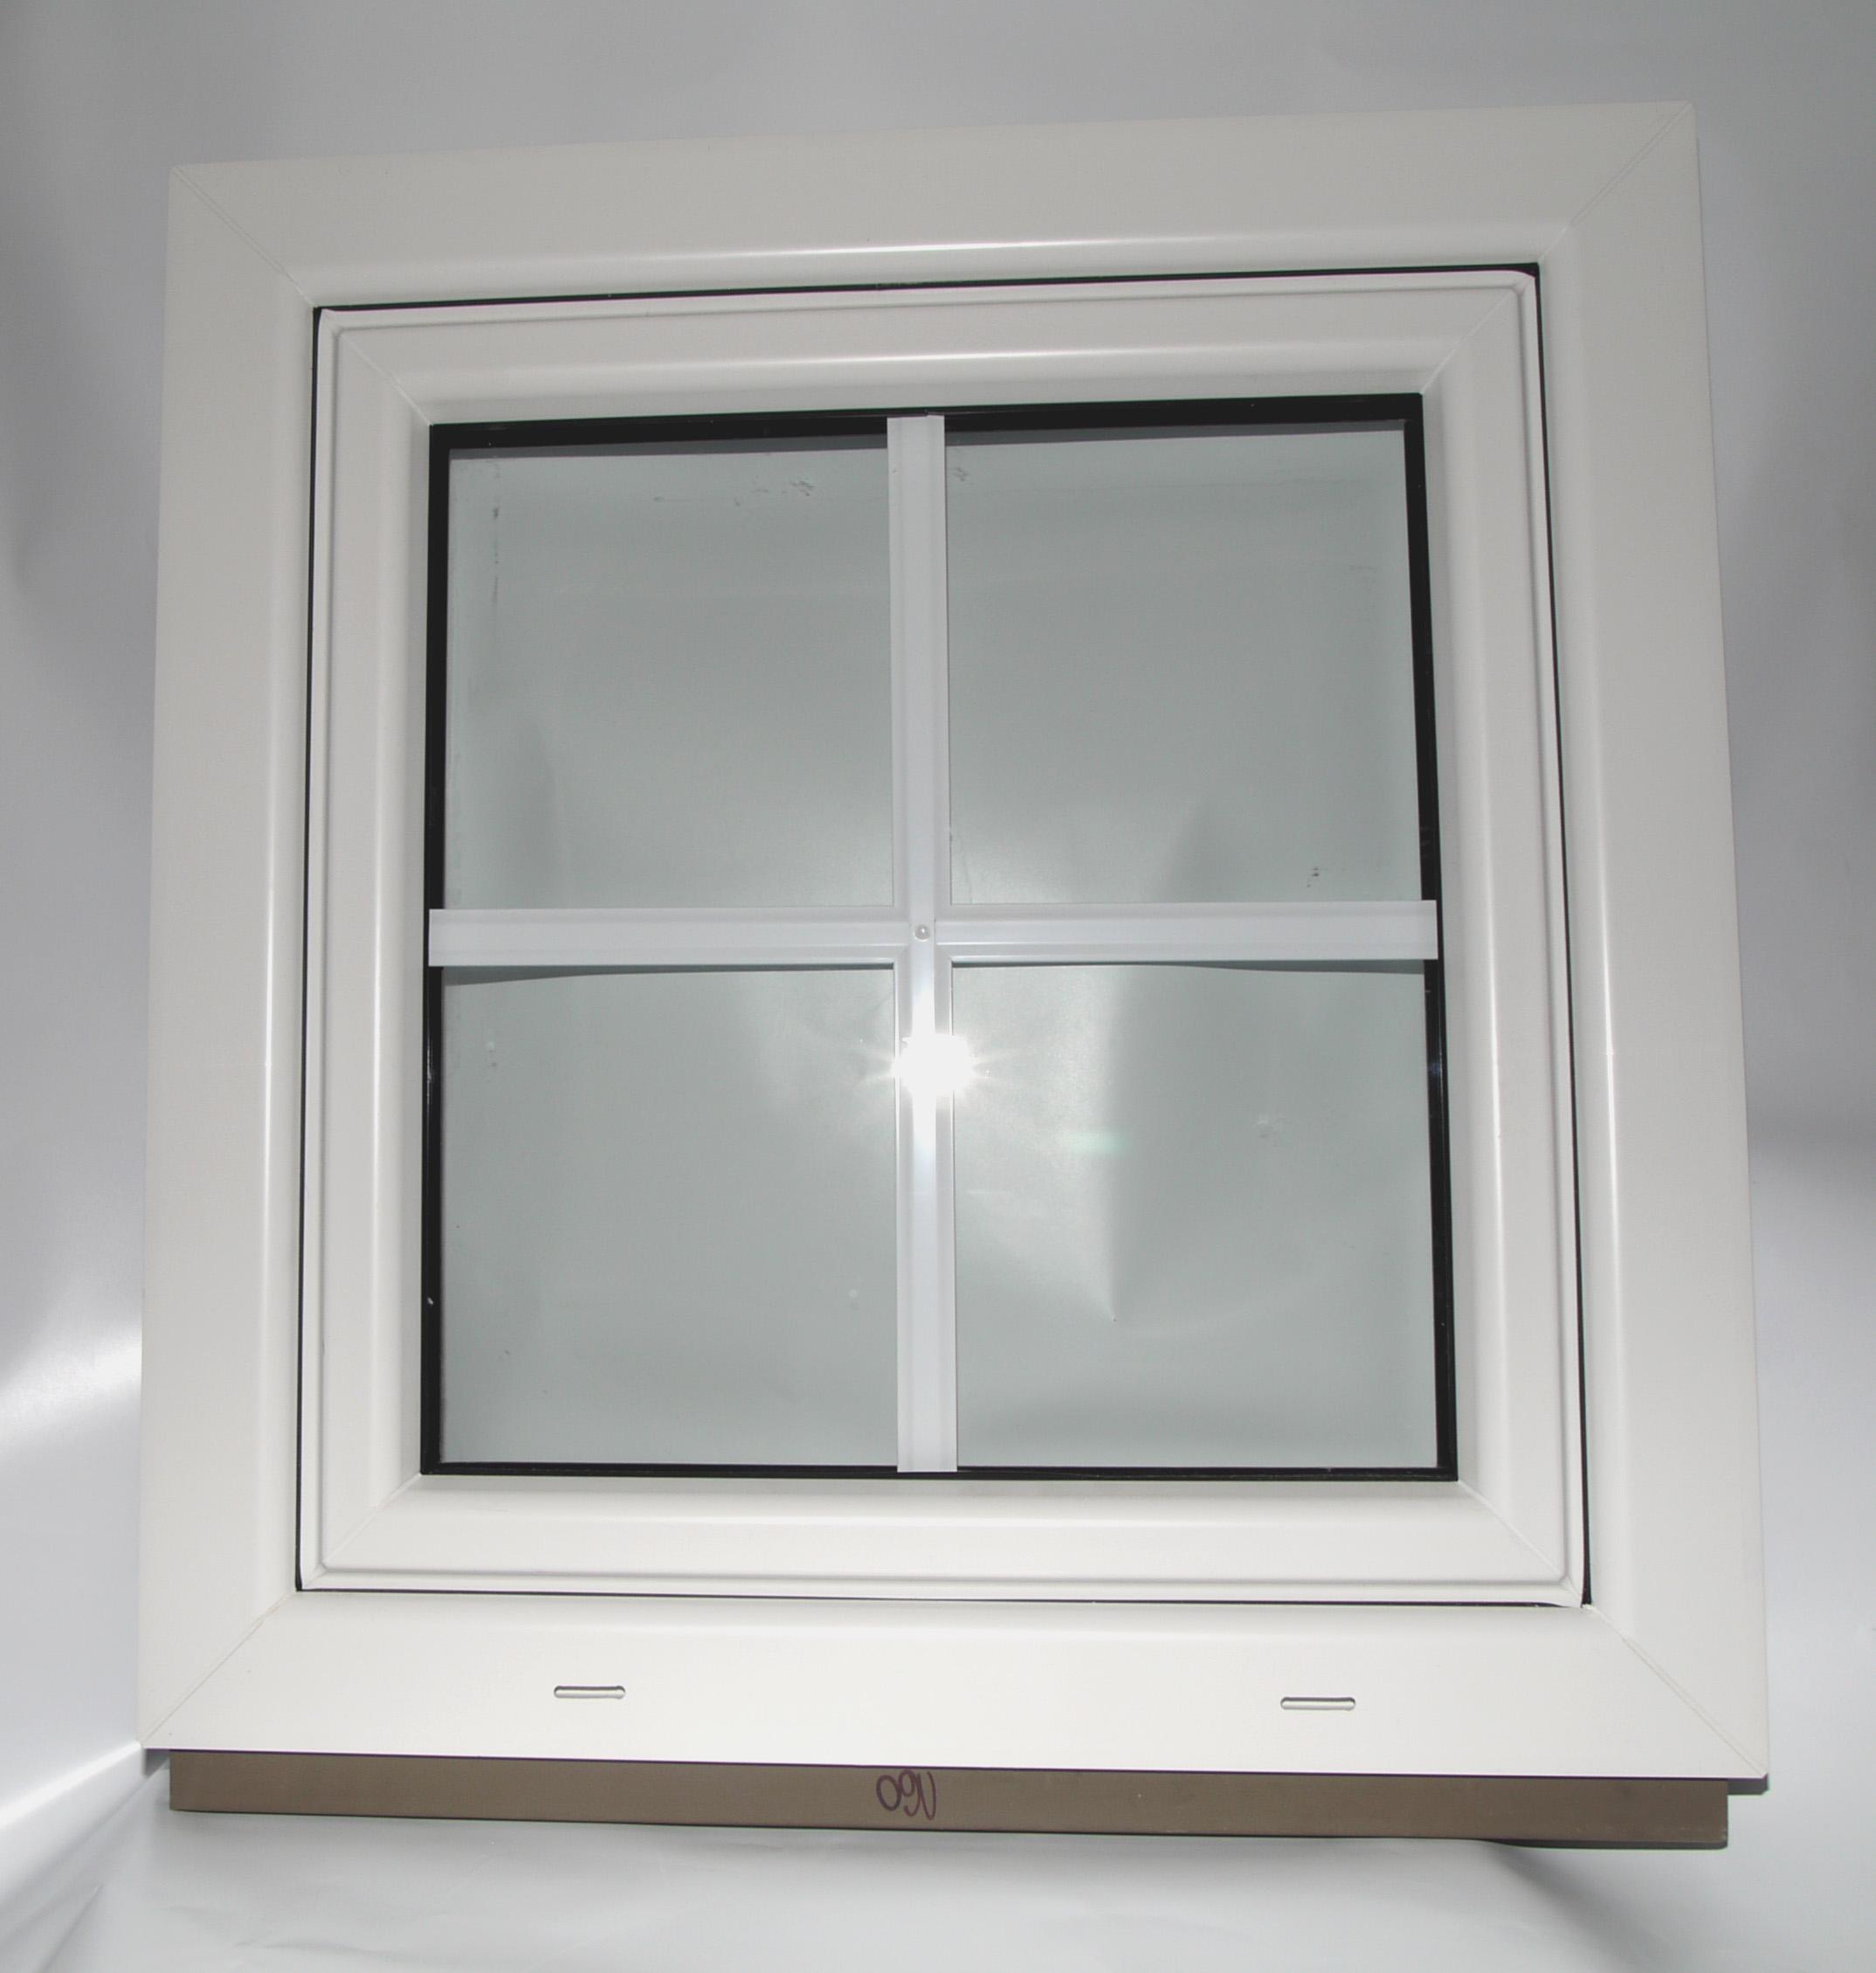 Sprossenfenster kunststoff for Fenster welten gmbh